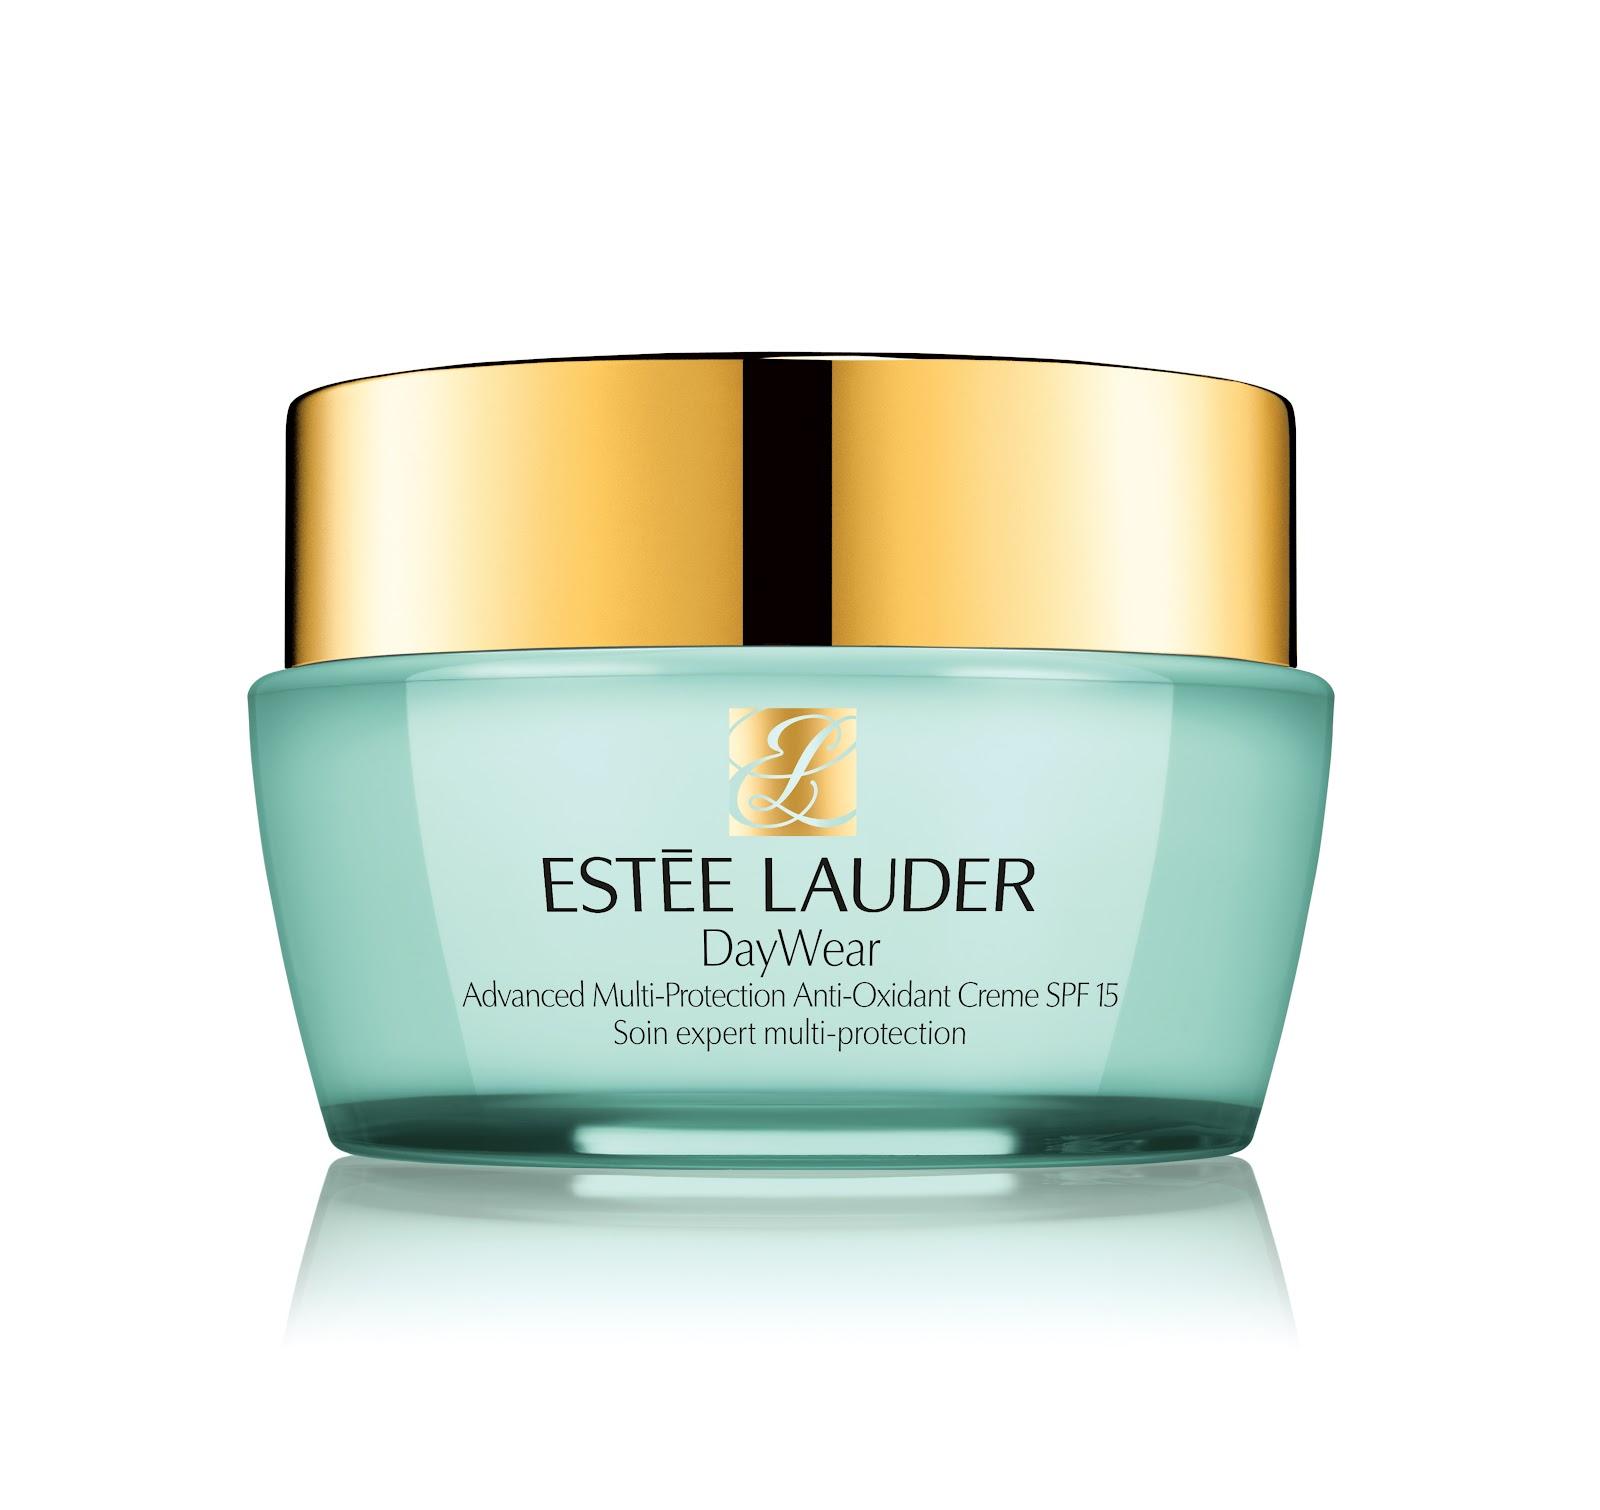 DayWear Multi-Protection Anti-Oxidant Sheer Tint Release Moisturizer SPF 15 by Estée Lauder #21